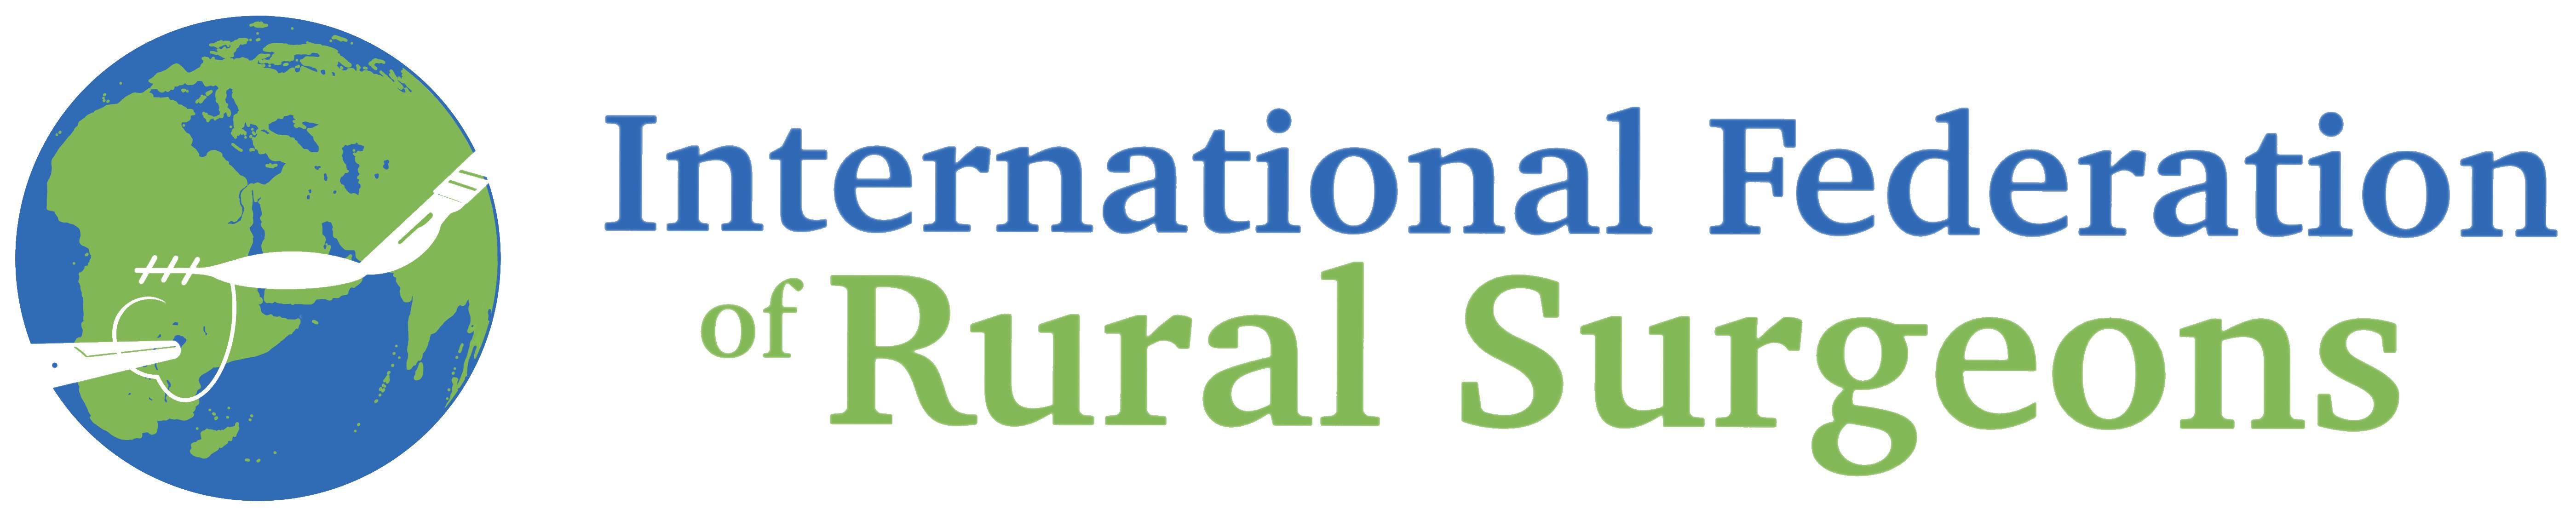 International Federation of Rural Surgeons